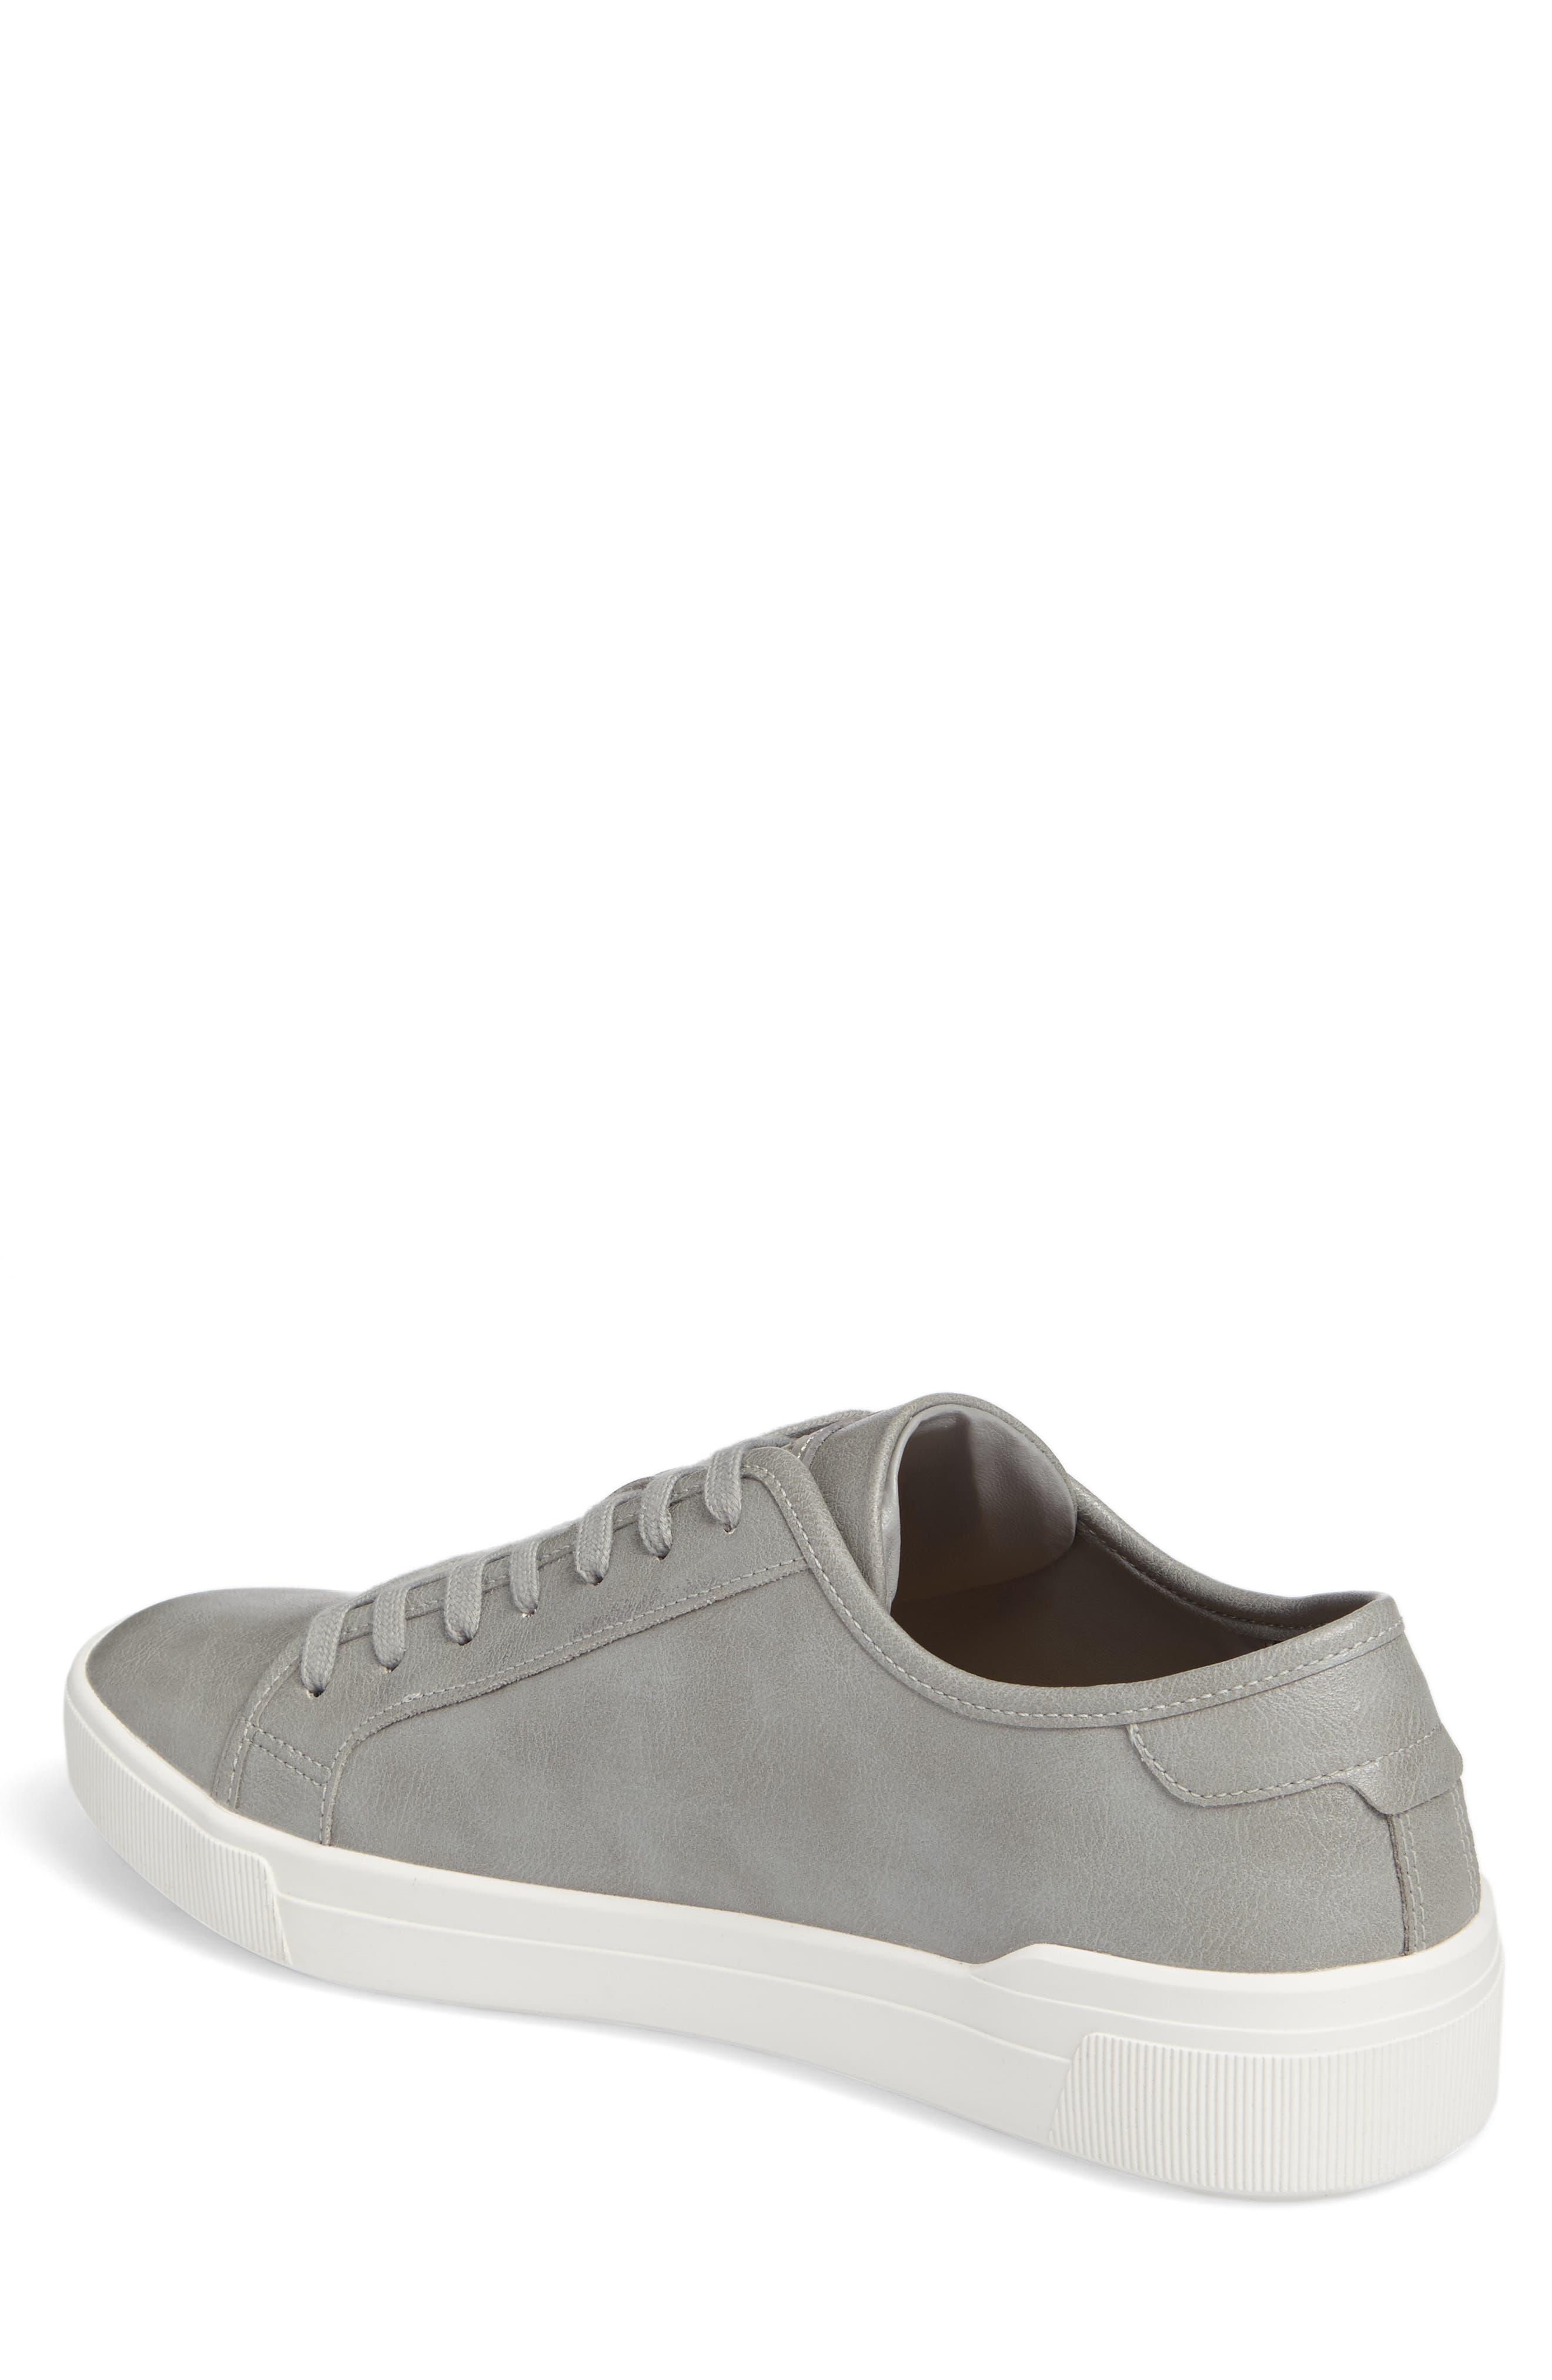 Haener Sneaker,                             Alternate thumbnail 2, color,                             Medium Grey